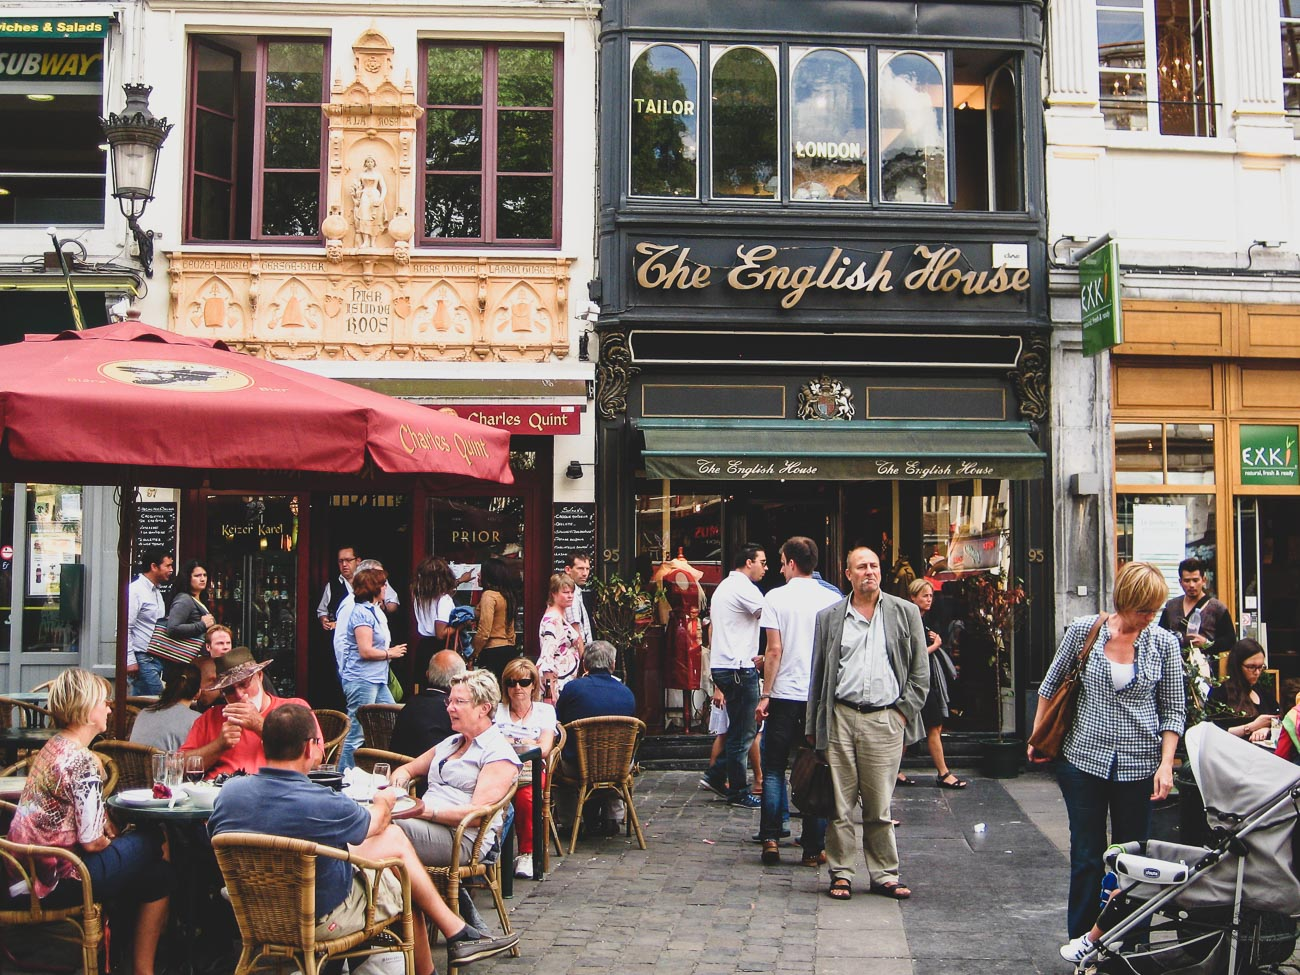 Bruksela największe atrakcje turystyczne